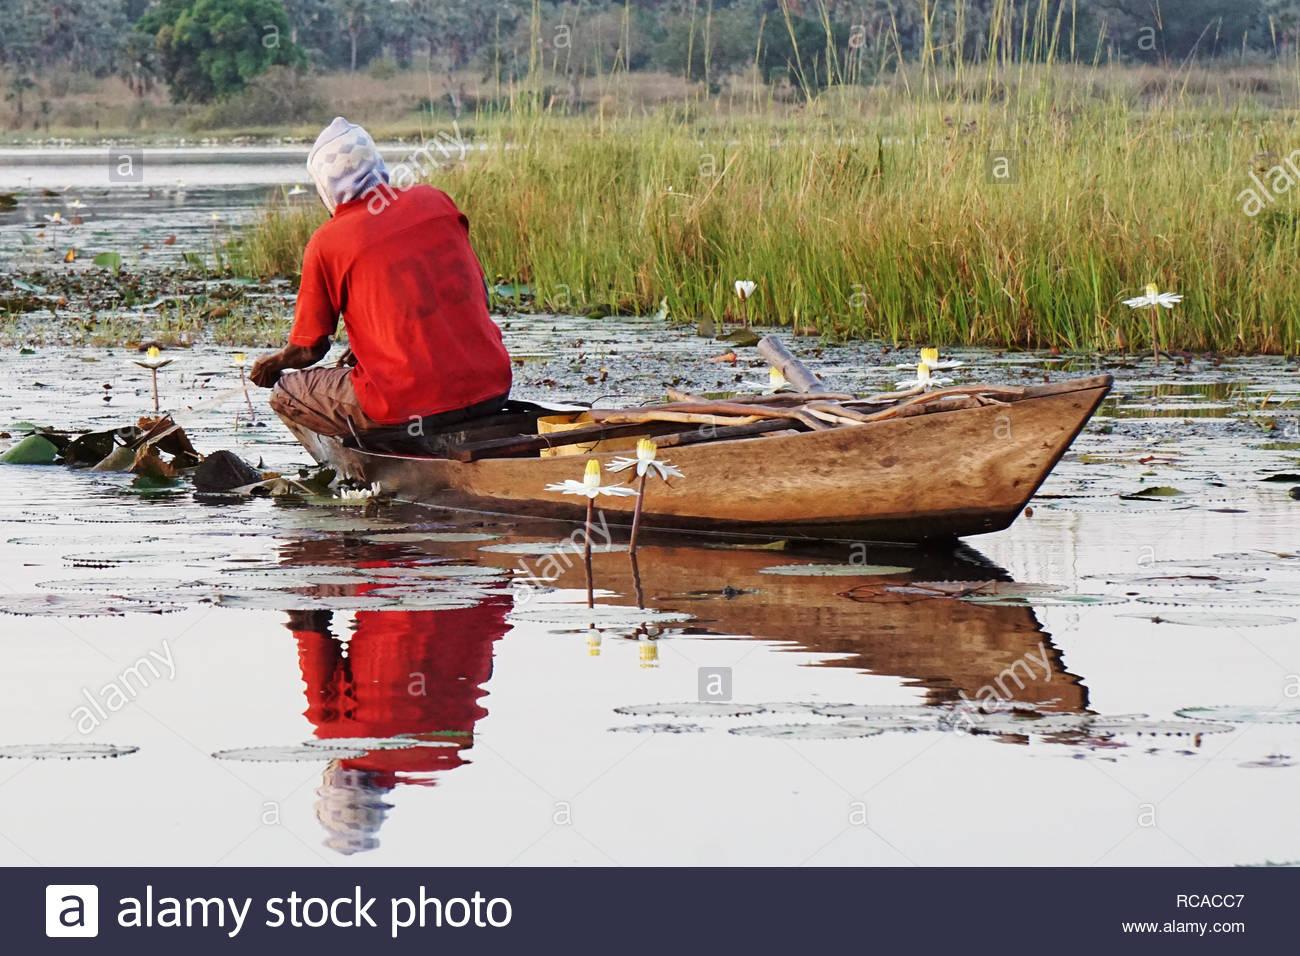 fisherman fishing in a little boat on the lake tengrela in africa, burkina faso Stock Photo